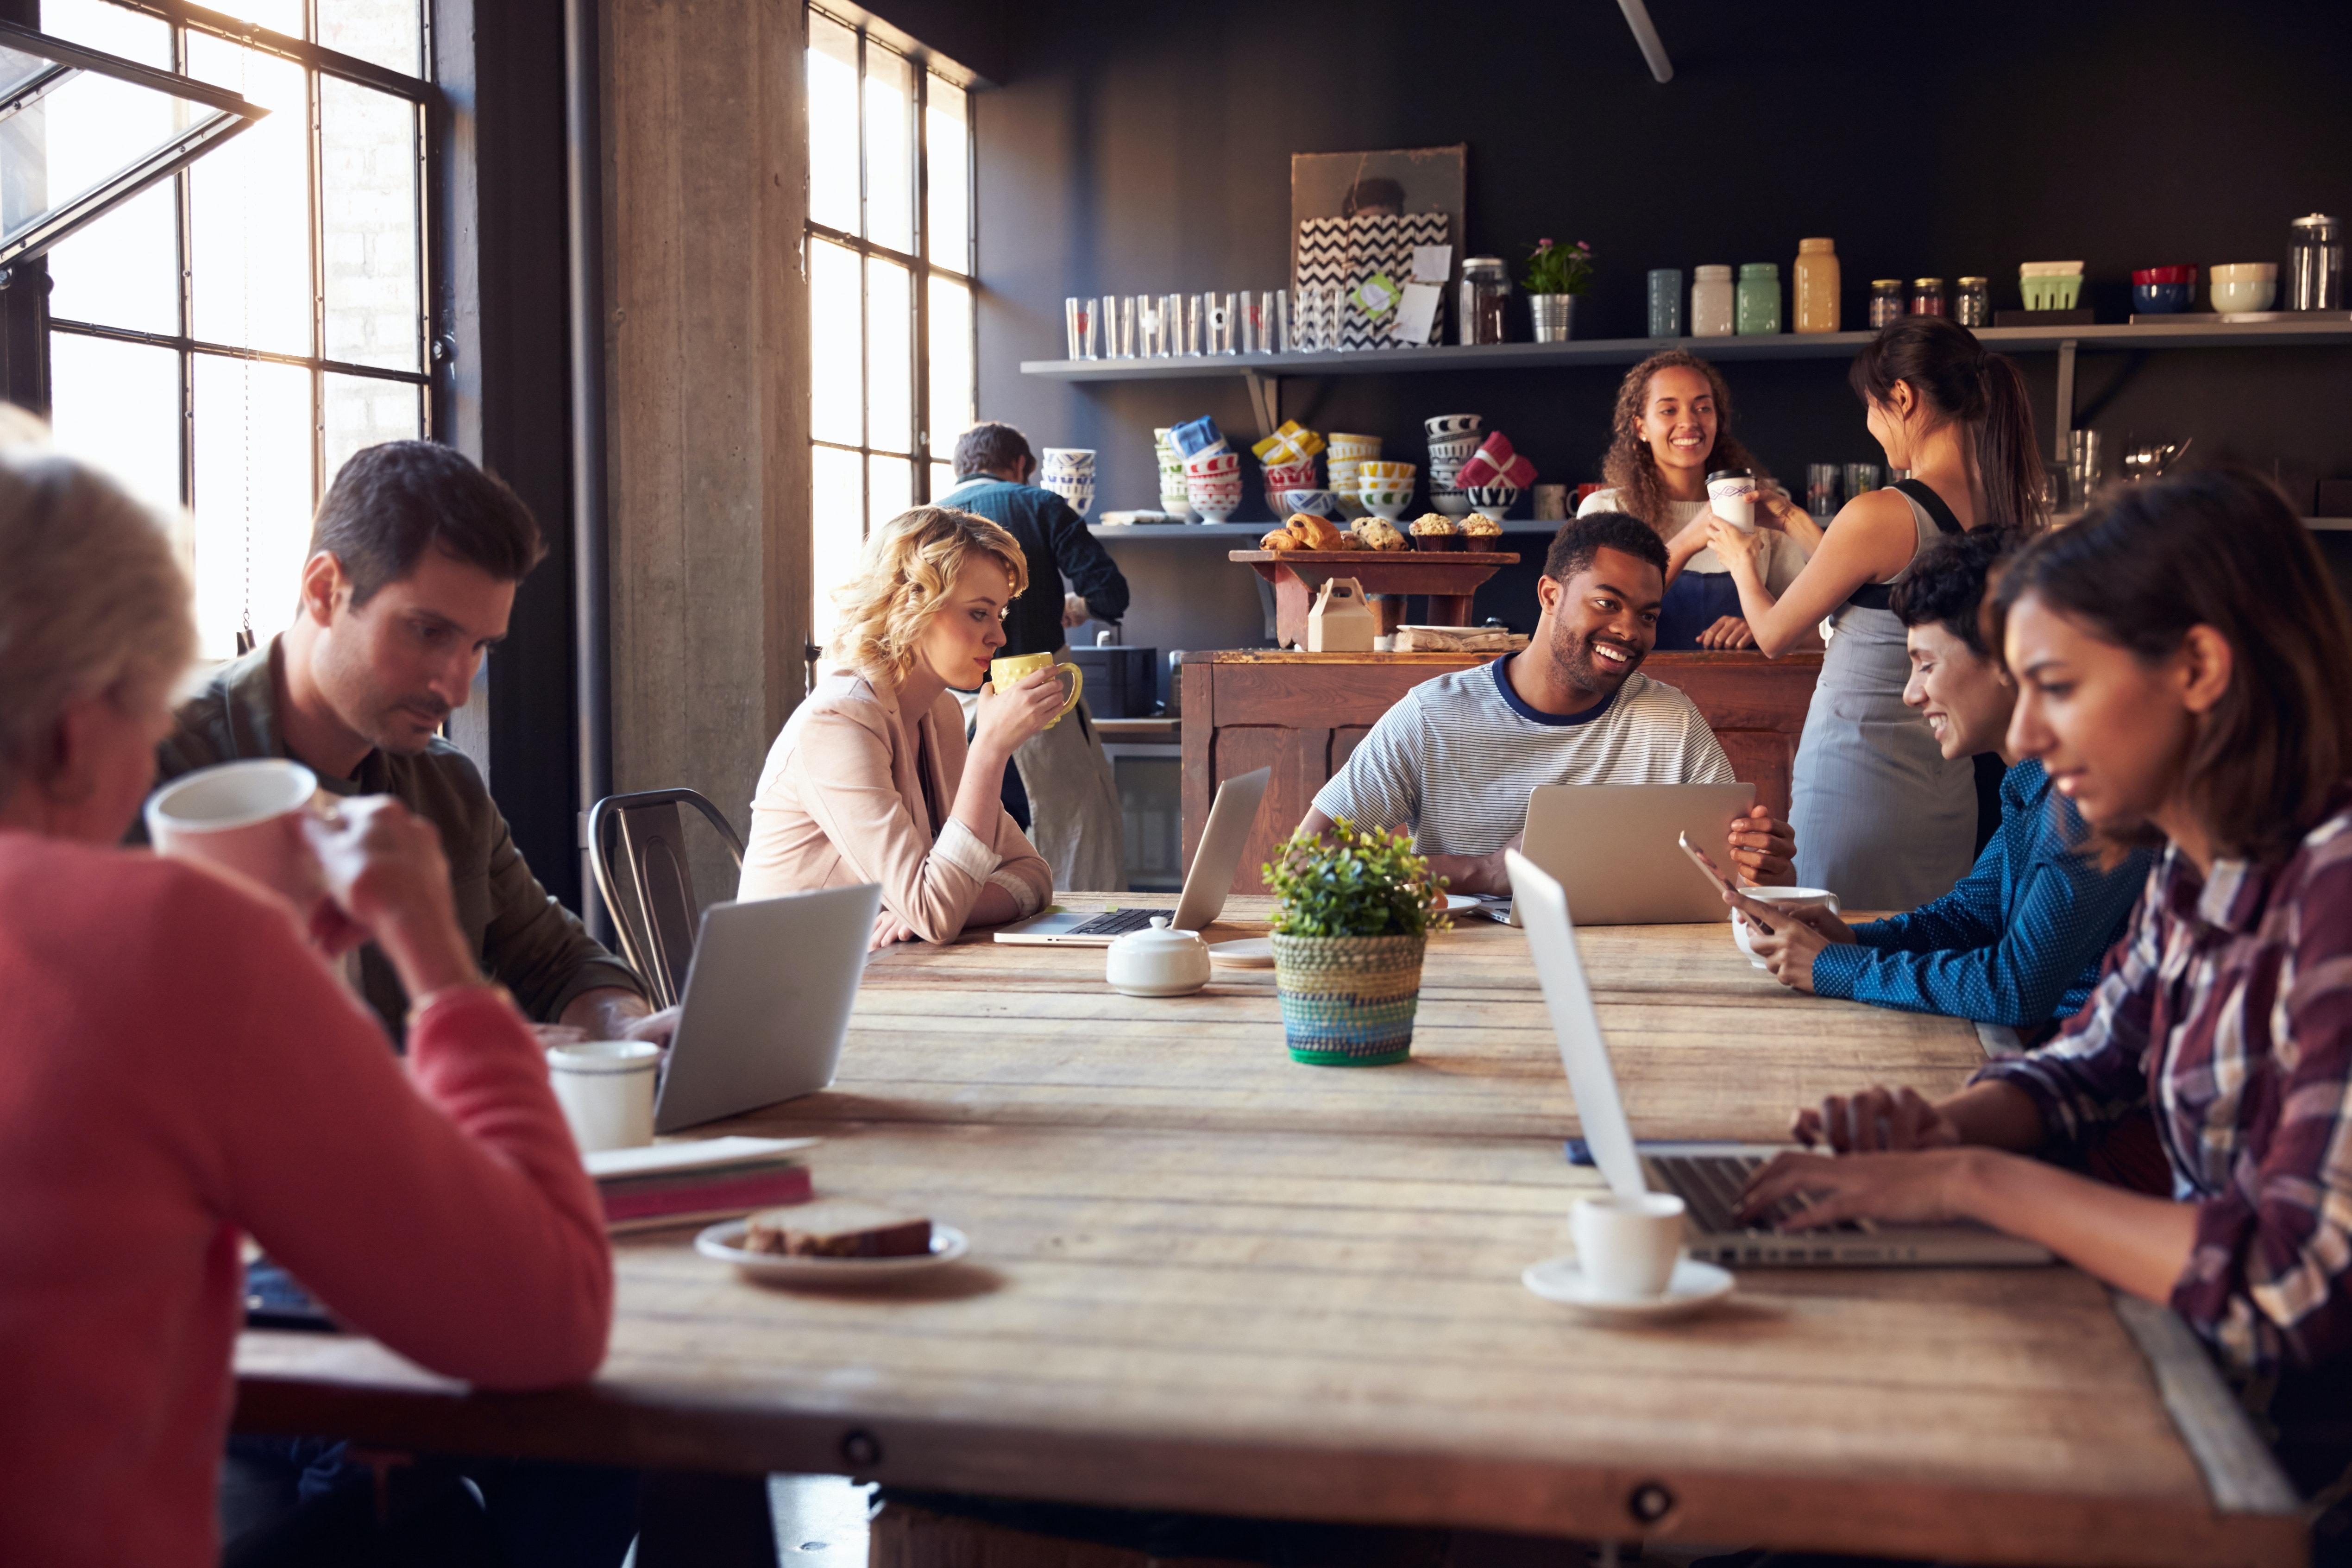 People in coffee shop using broadband